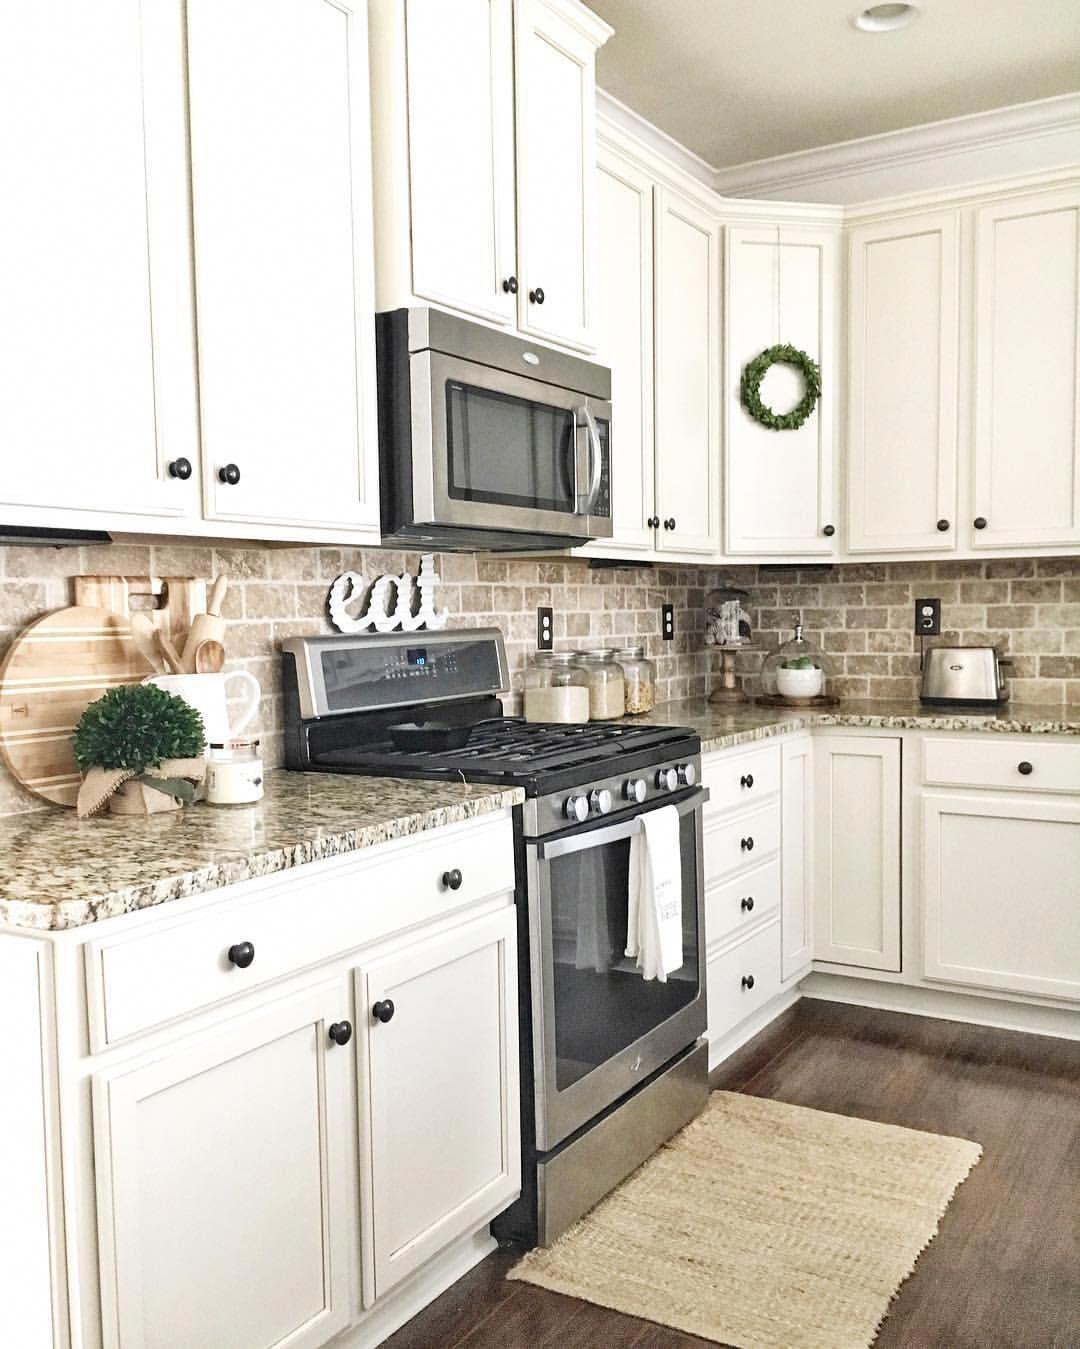 9 Inventive Tricks Kitchen Remodel Colors Islands Inexpensive Kitchen Remodel Laundry Rooms Si En 2020 Muebles De Cocina Esquineros Estilo De Cocina Muebles De Cocina